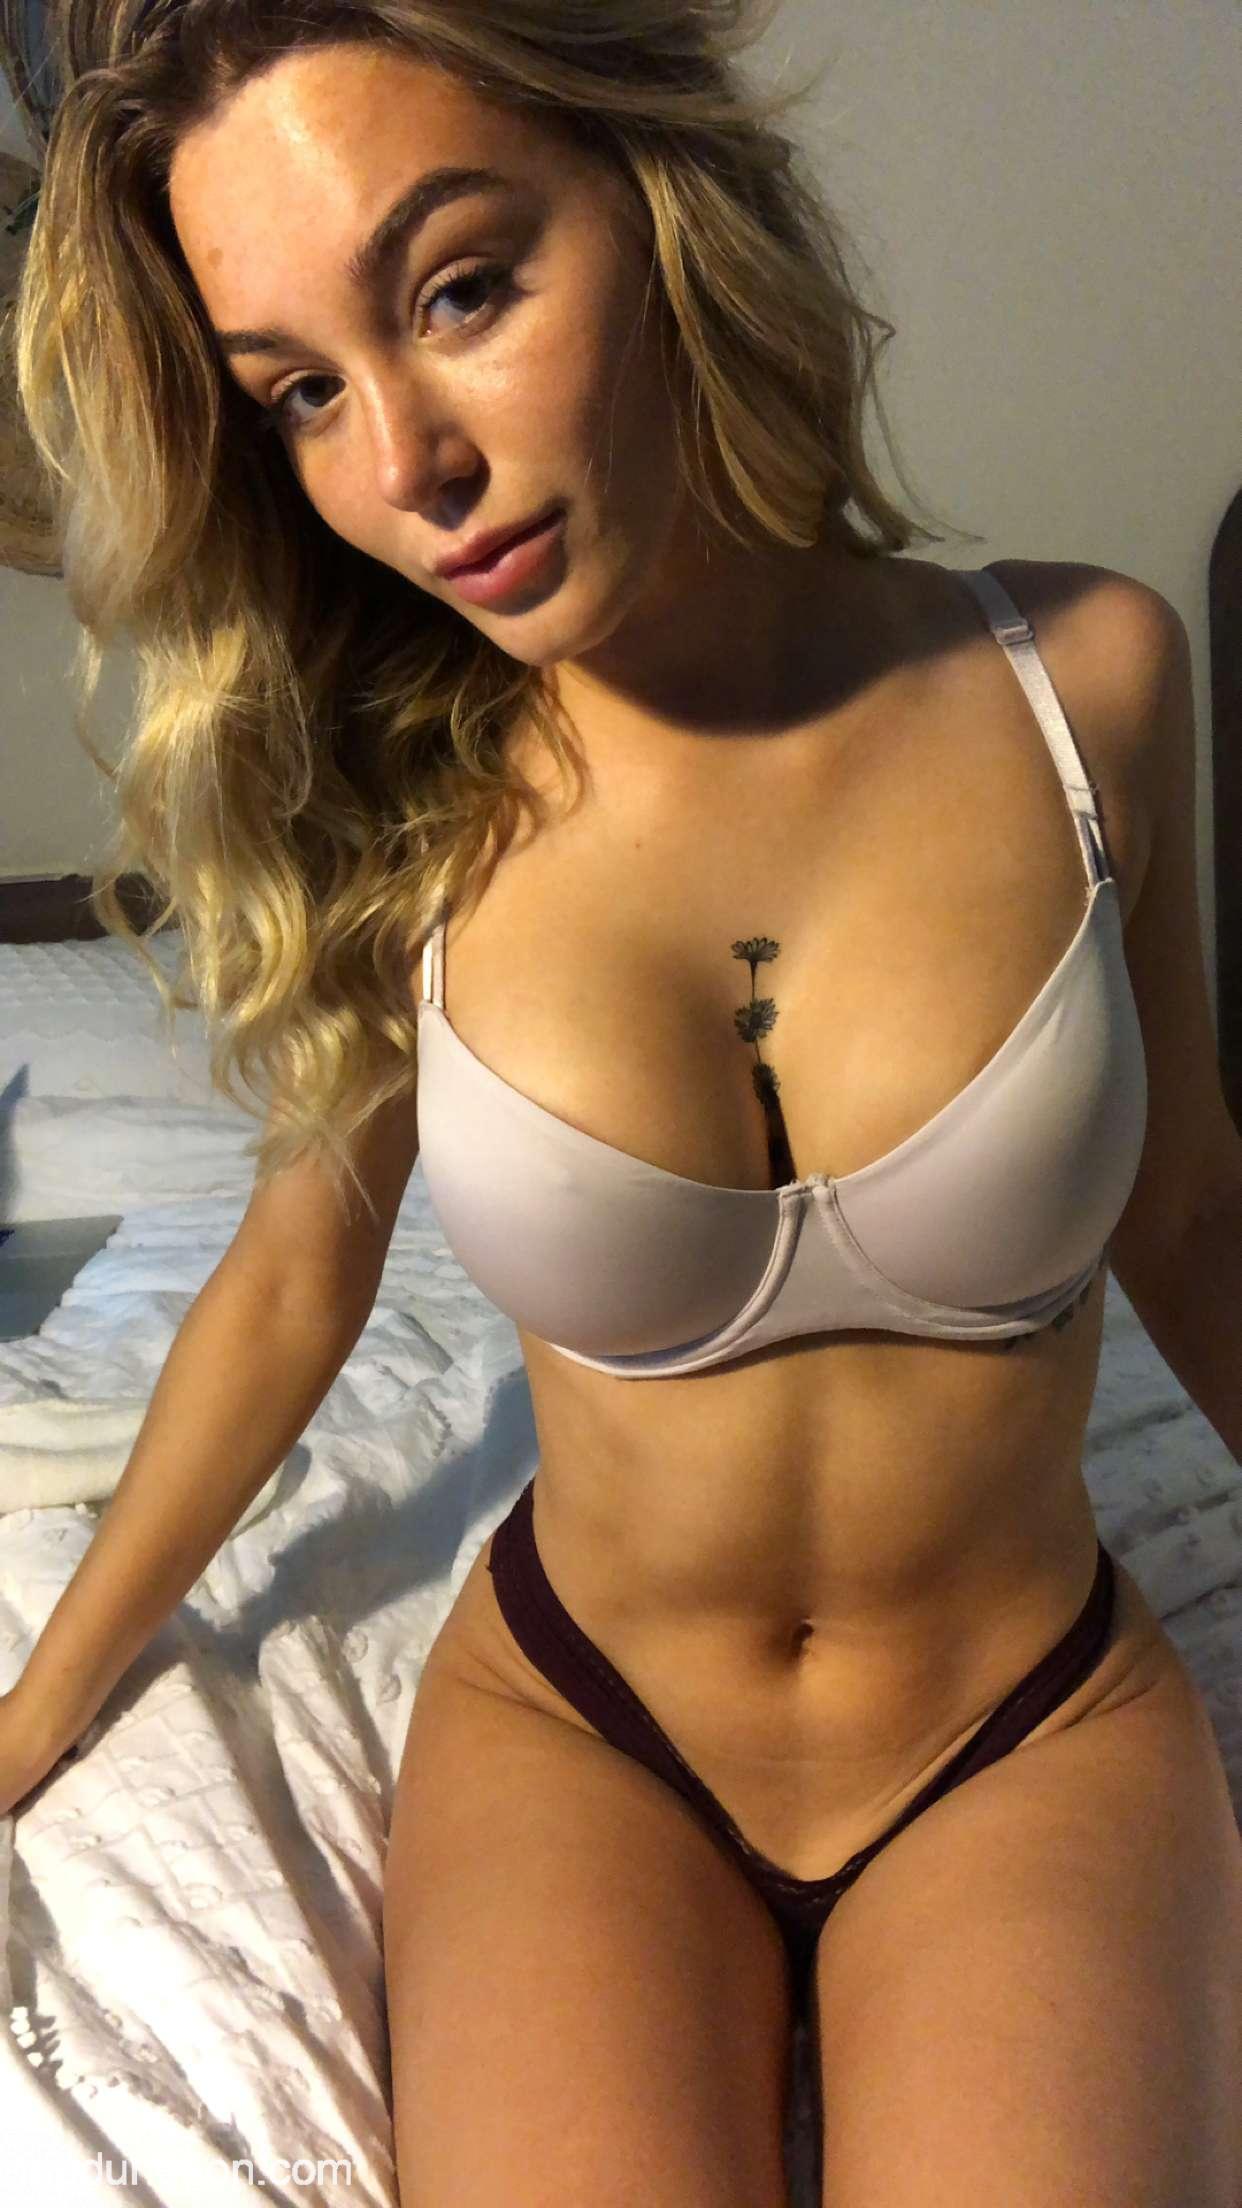 Heidi Grey Leaked